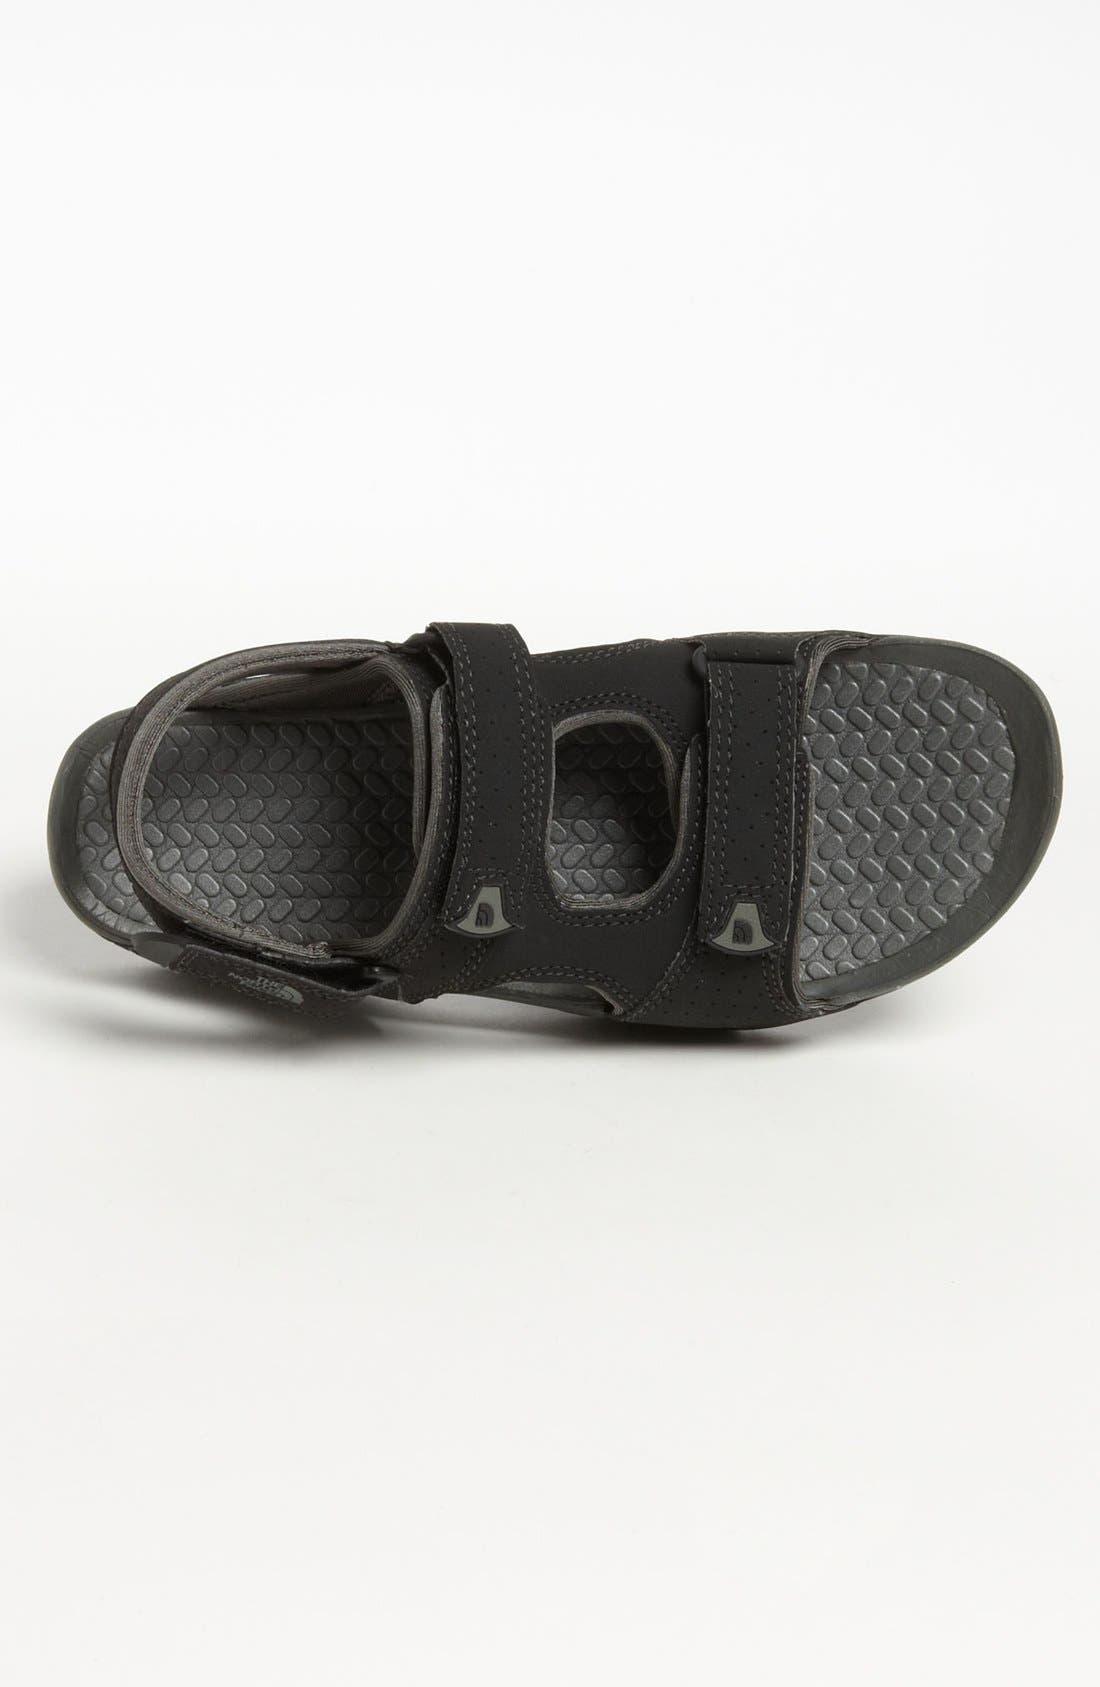 Alternate Image 3  - The North Face 'El Rio II' Sandal (Men)